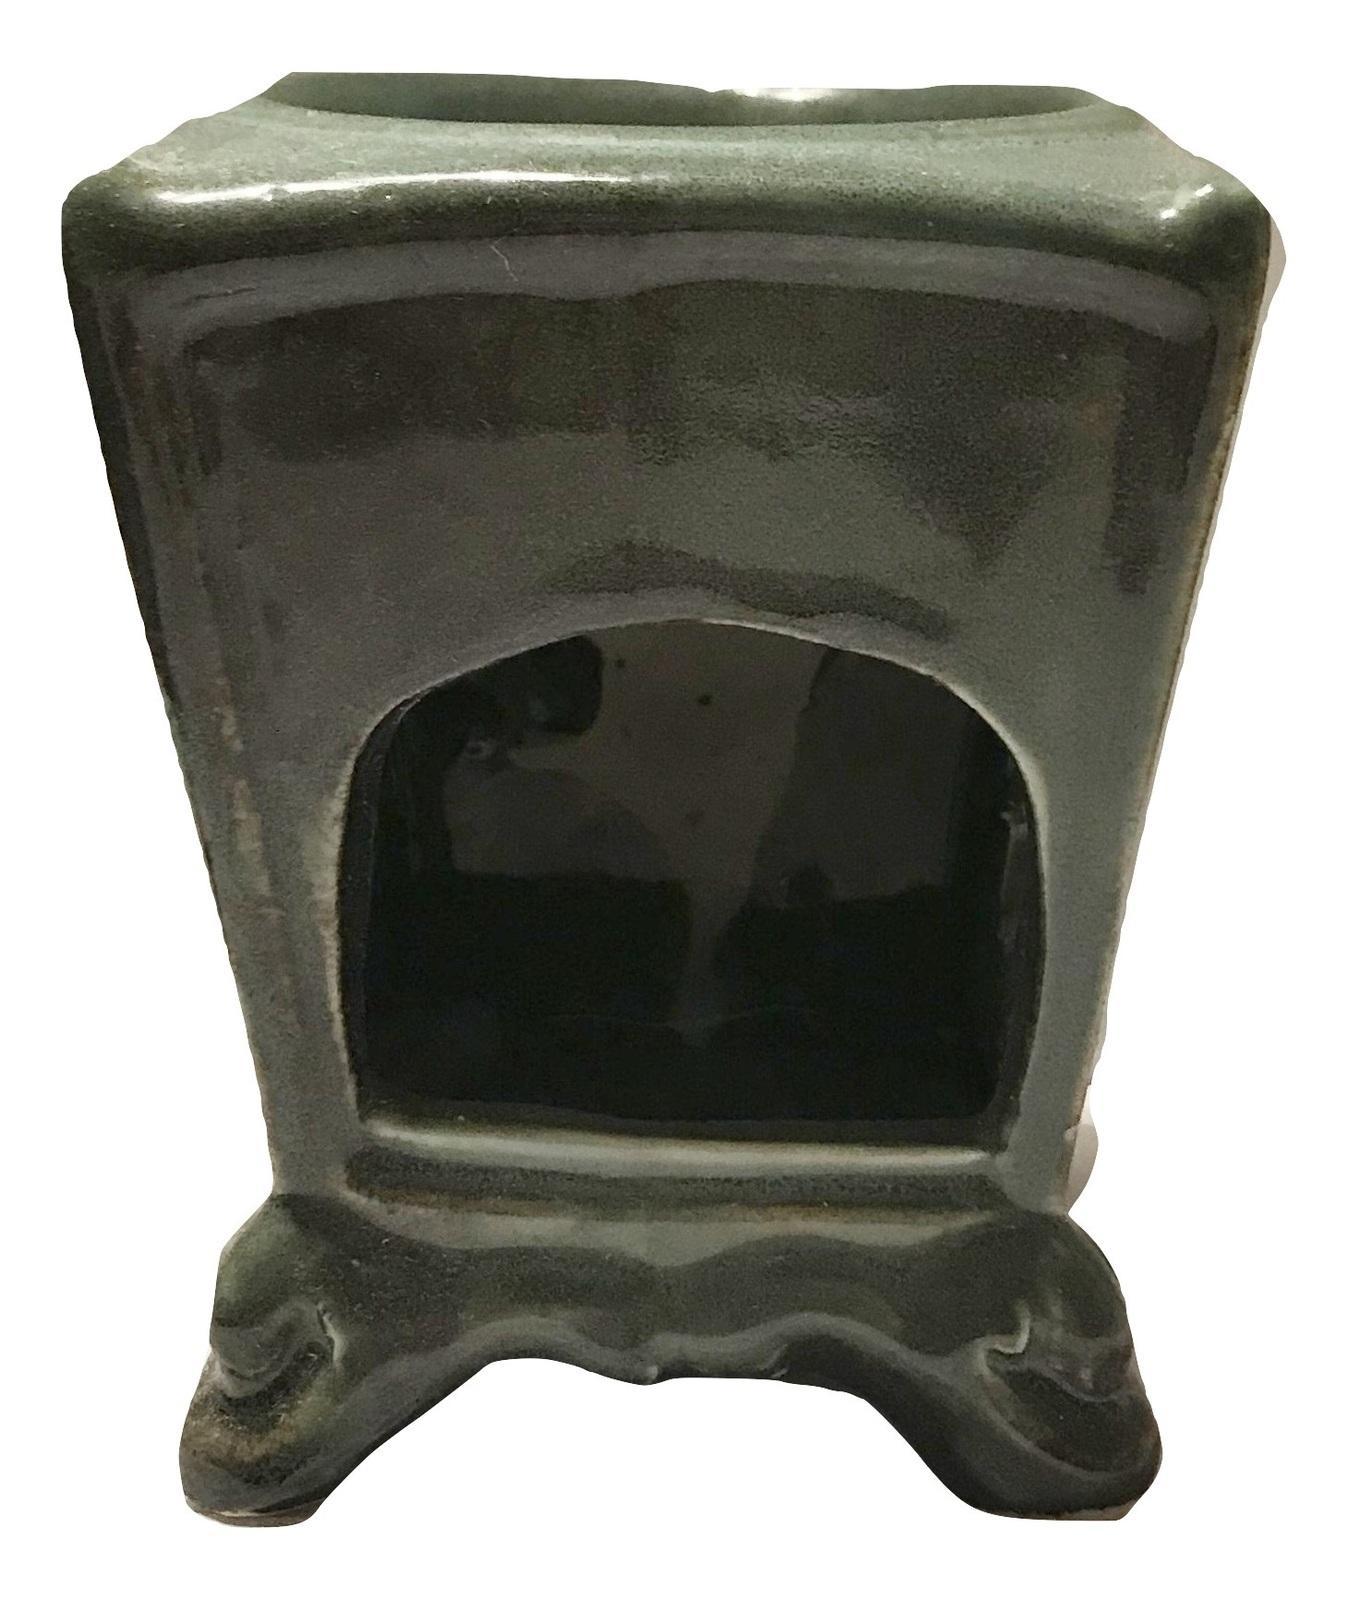 Green Ceramic Lion Oil Burner